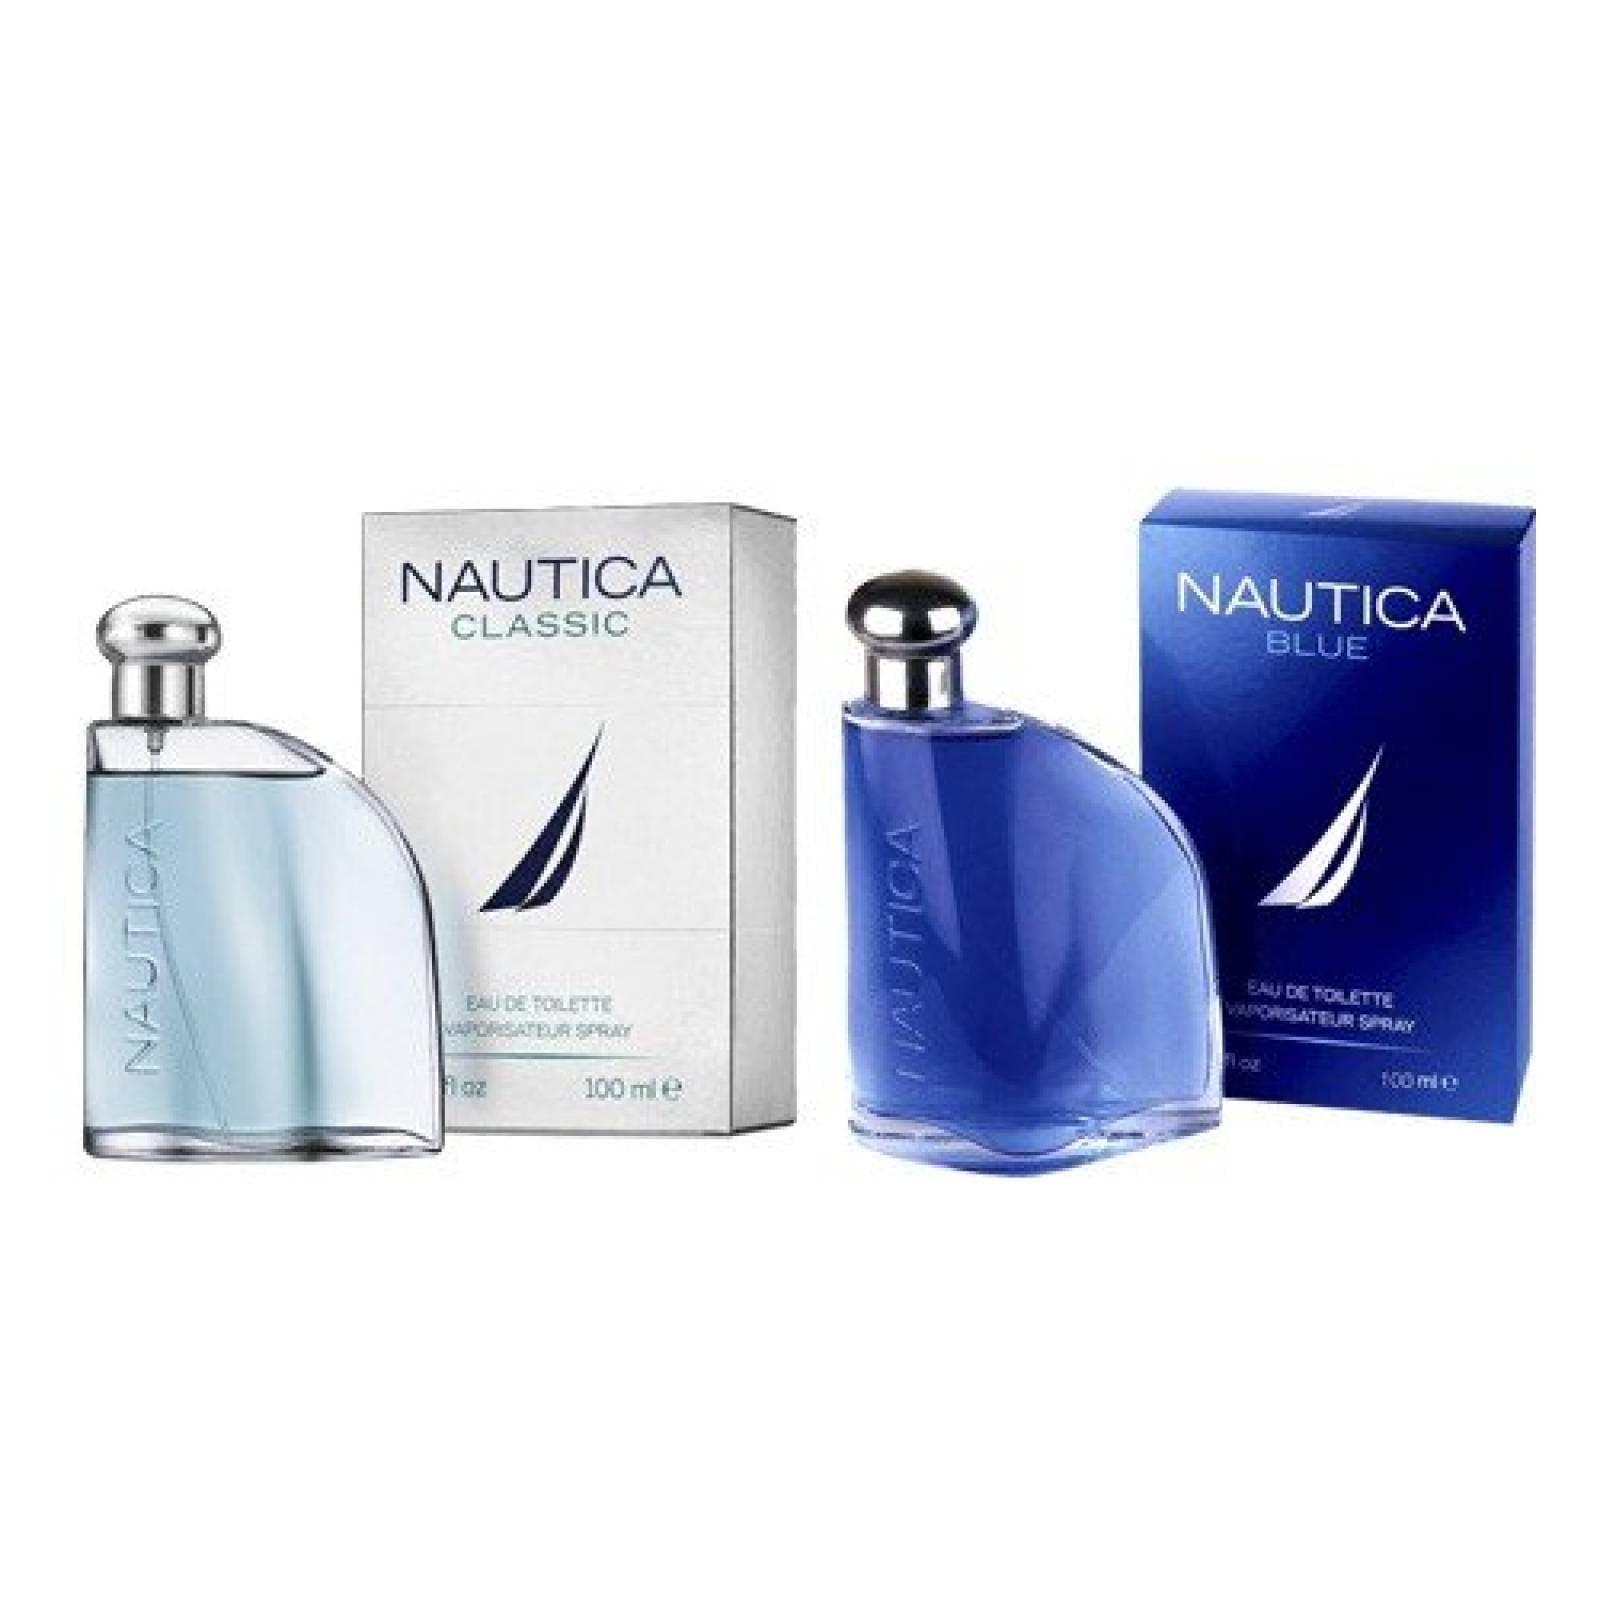 Paquete 2X1 Nautica Blue Y Classic 100 de Nautica Fragancia para Caballero